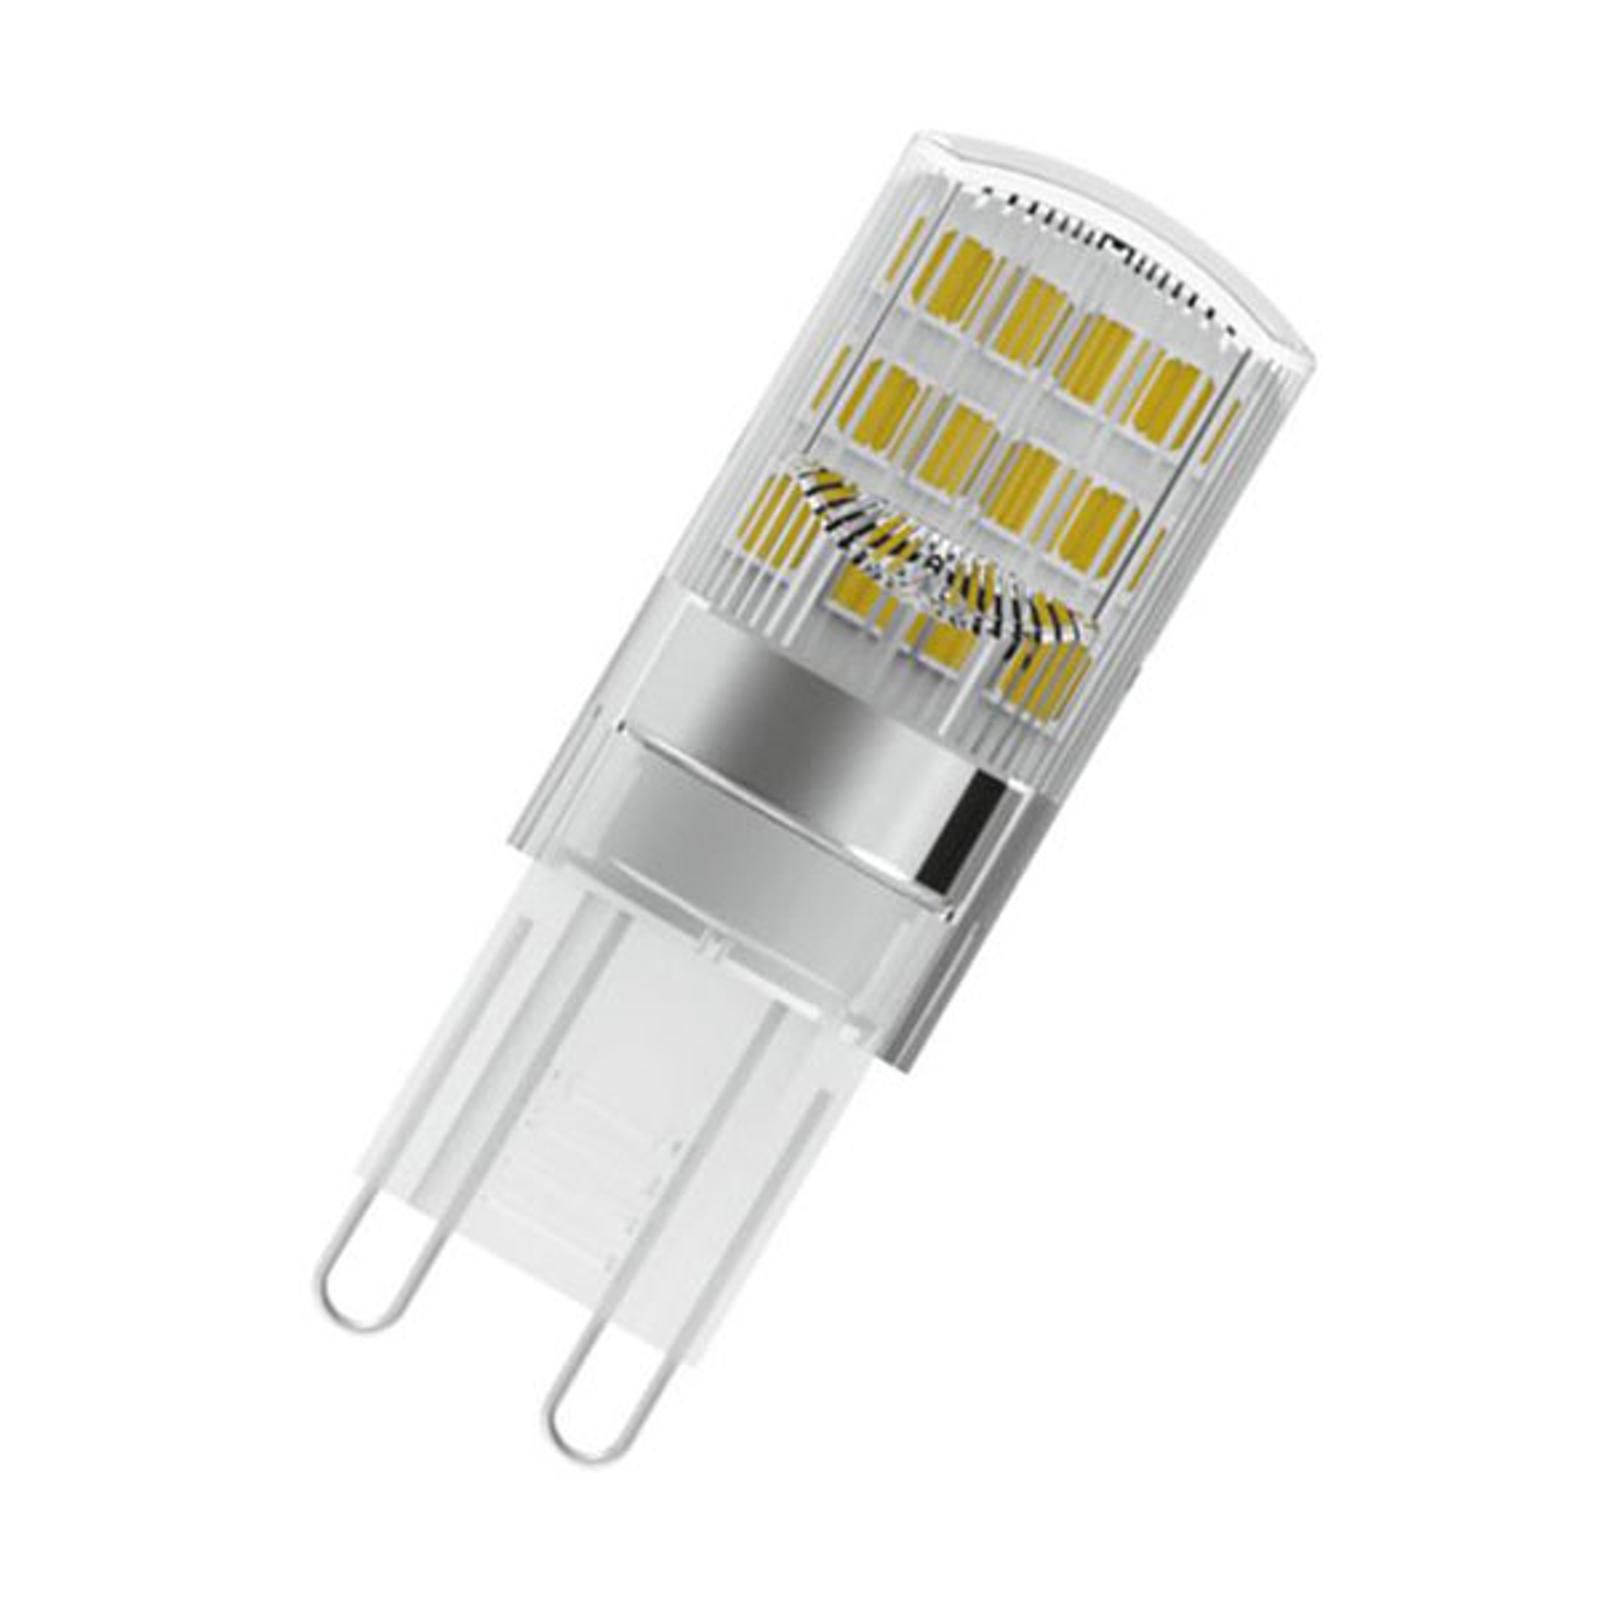 OSRAM 2 ampoules broche LED G9 1,9W 2700K transp